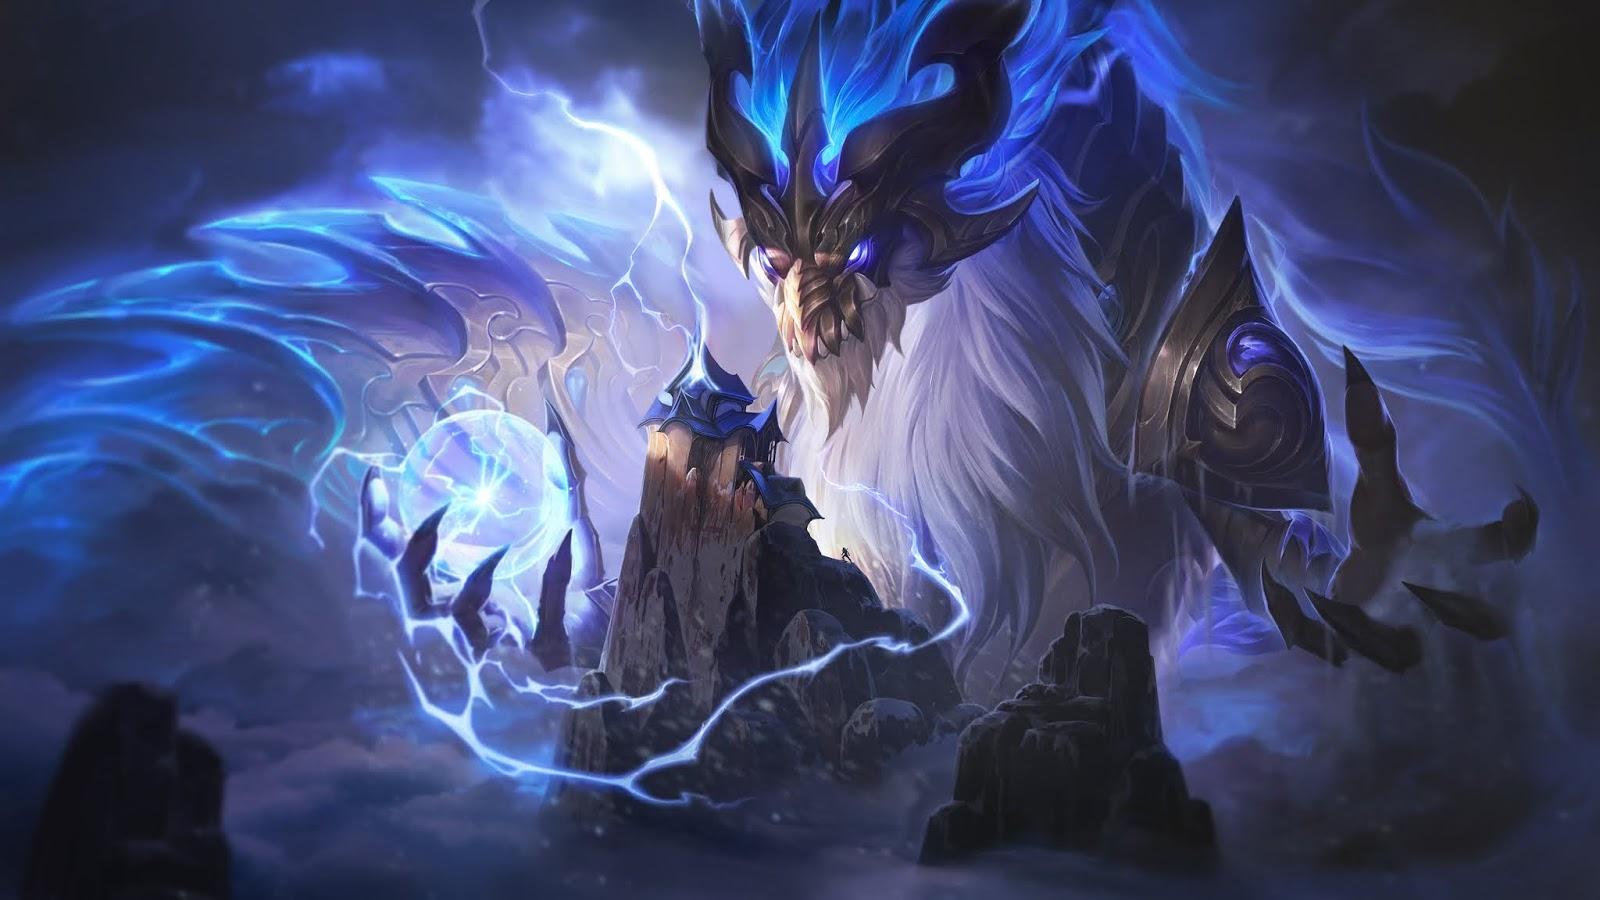 Storm Dragon Aurelion Sol Skin: Splash Art, Release Date, and